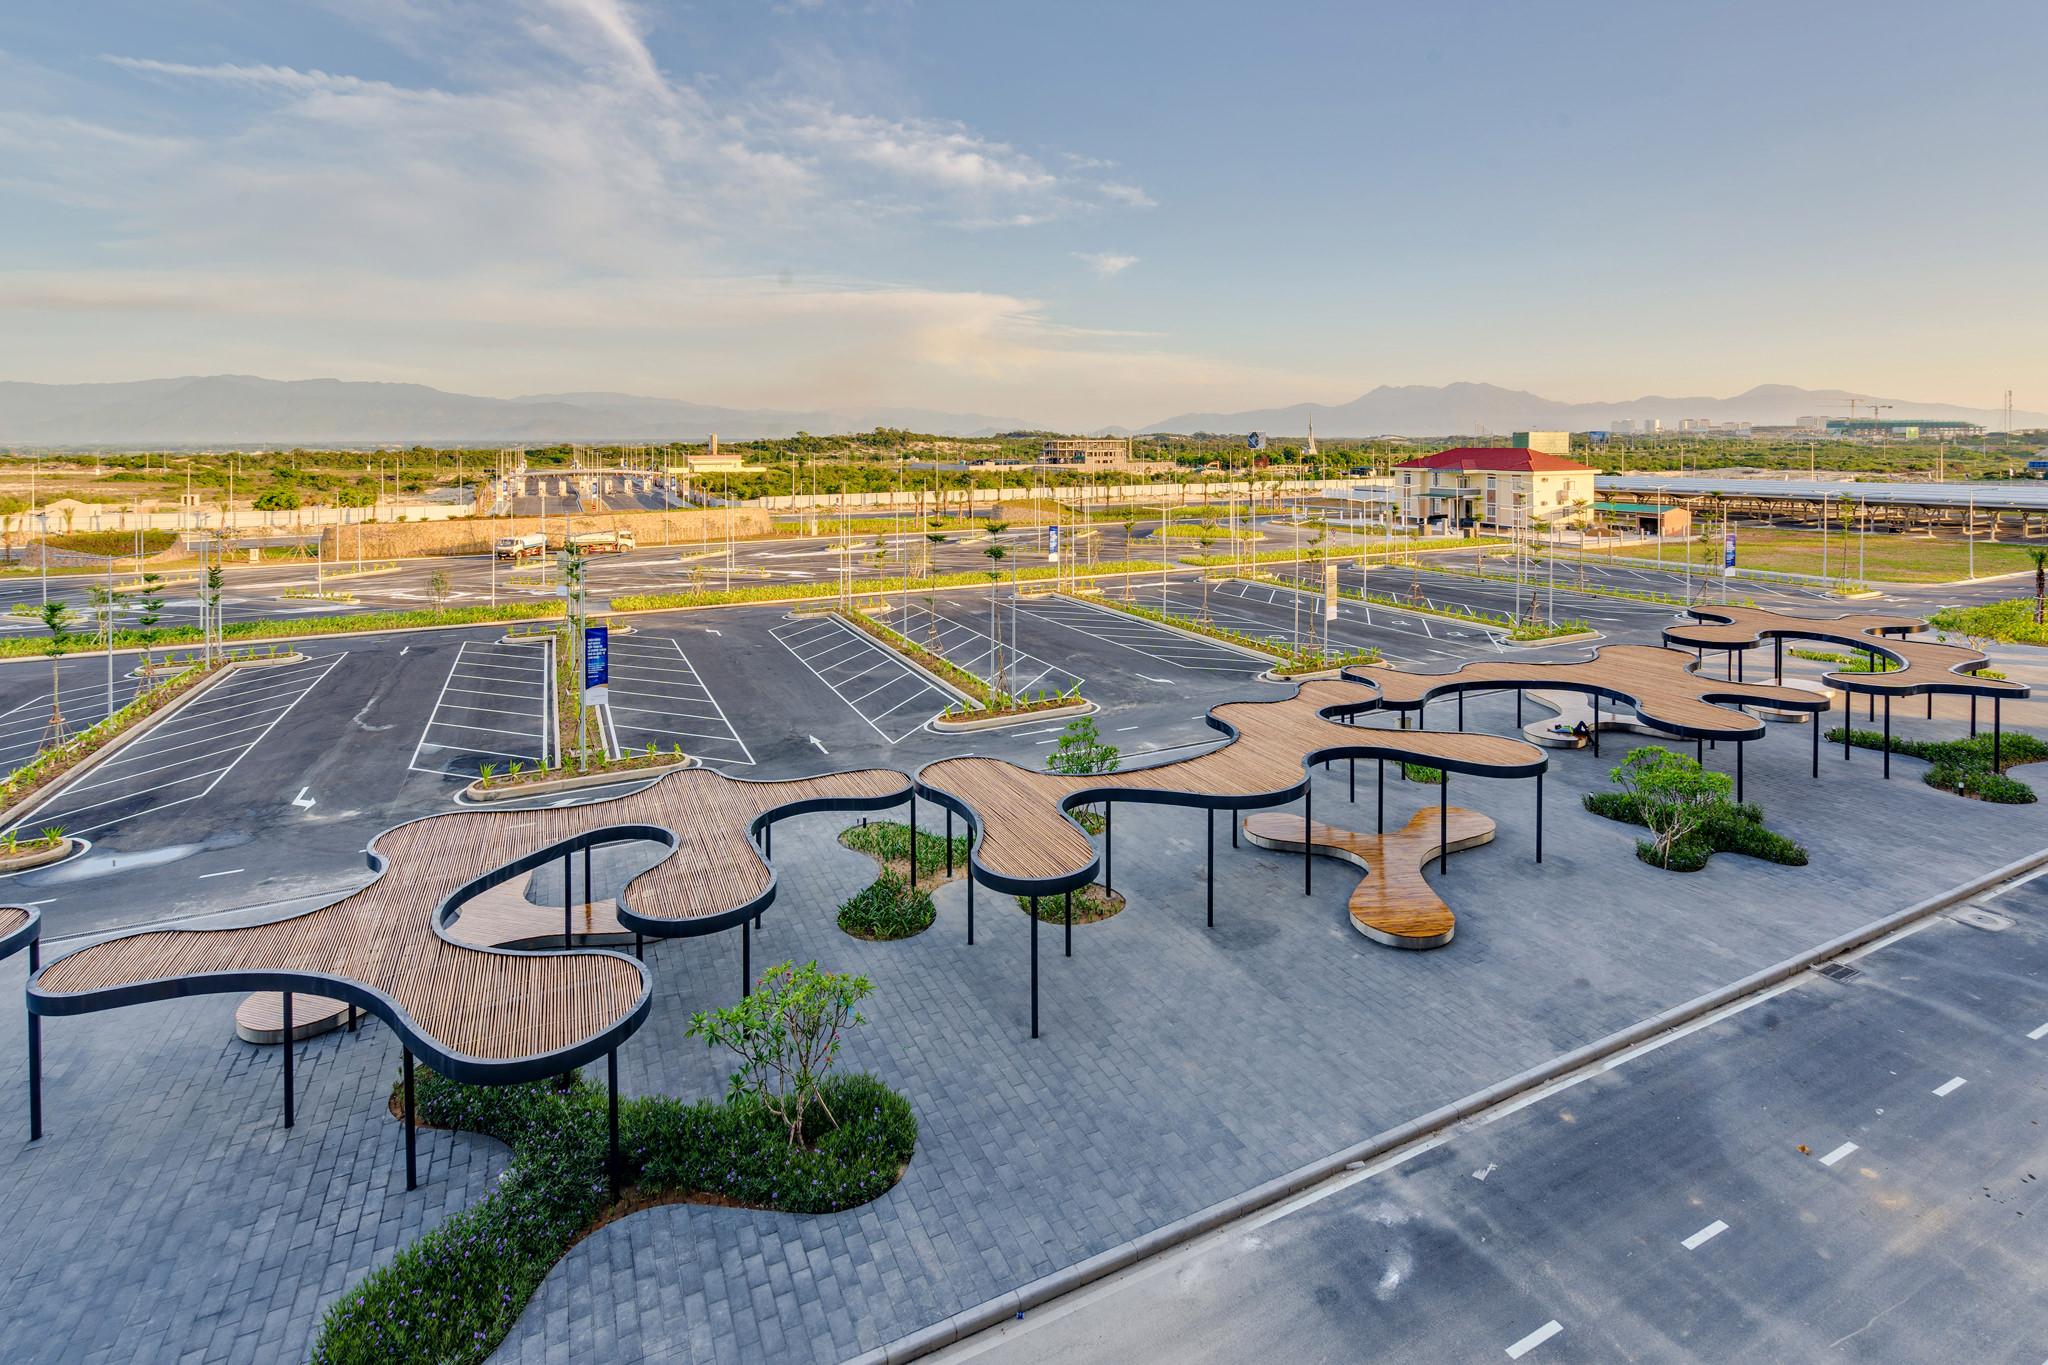 20180626 - Cam Ranh Airport - Architecture - 0060.jpg